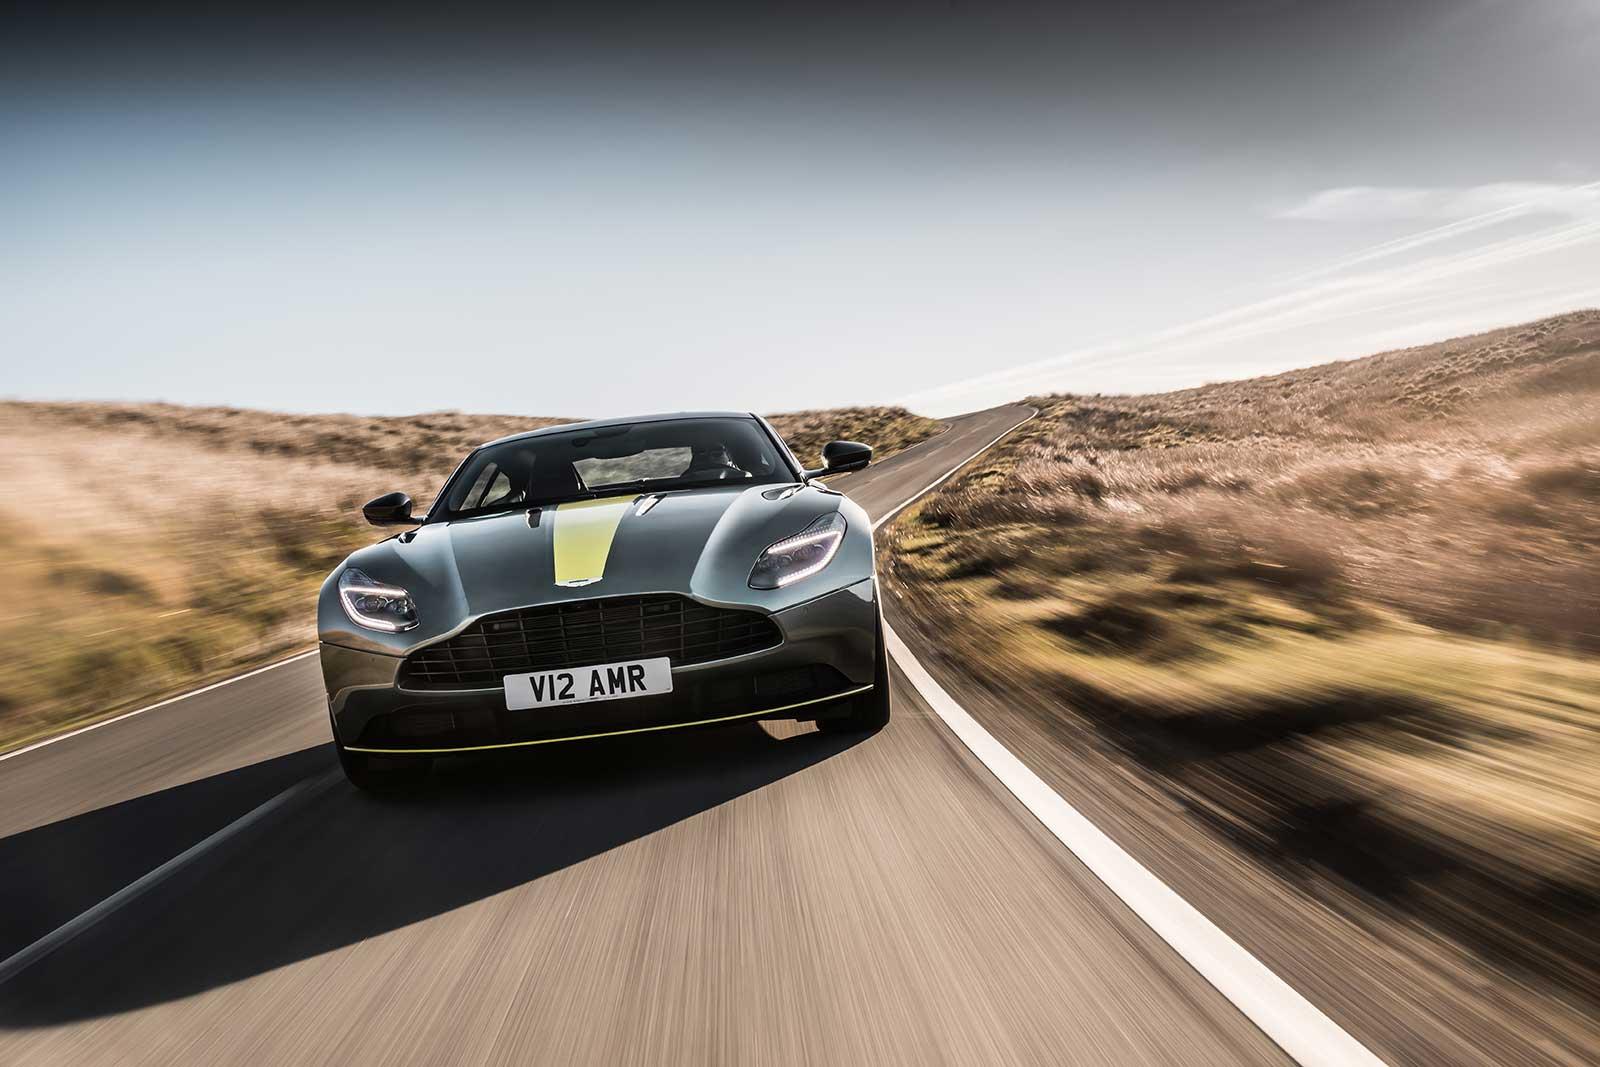 2019 Aston Martin DB11 AMR (6)